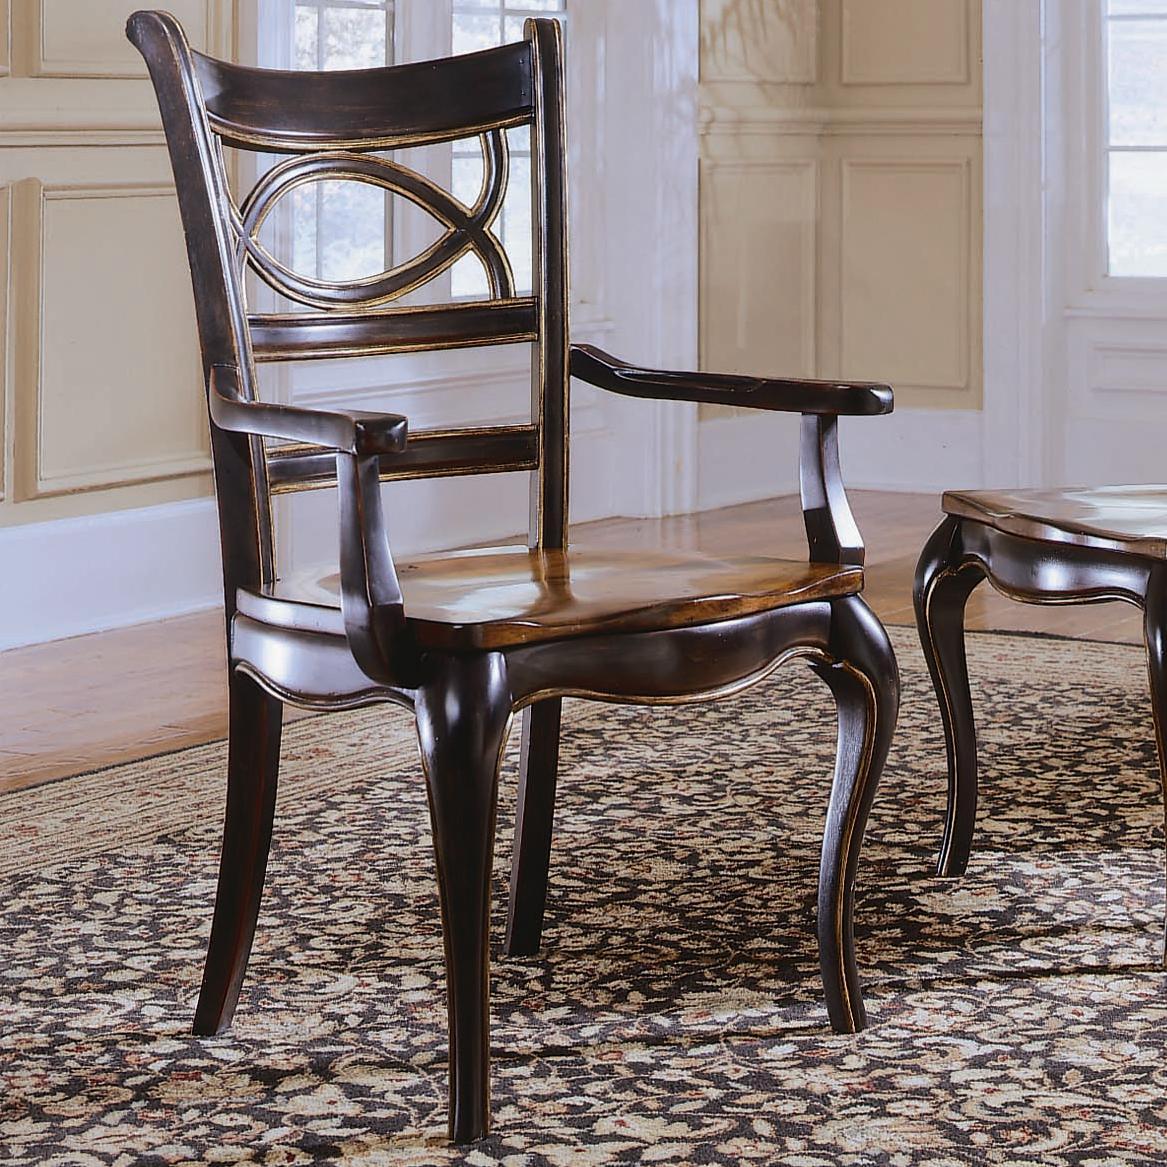 Hooker Furniture Preston Ridge Oval Back Dining Arm Chair - Item Number: 864-75-300